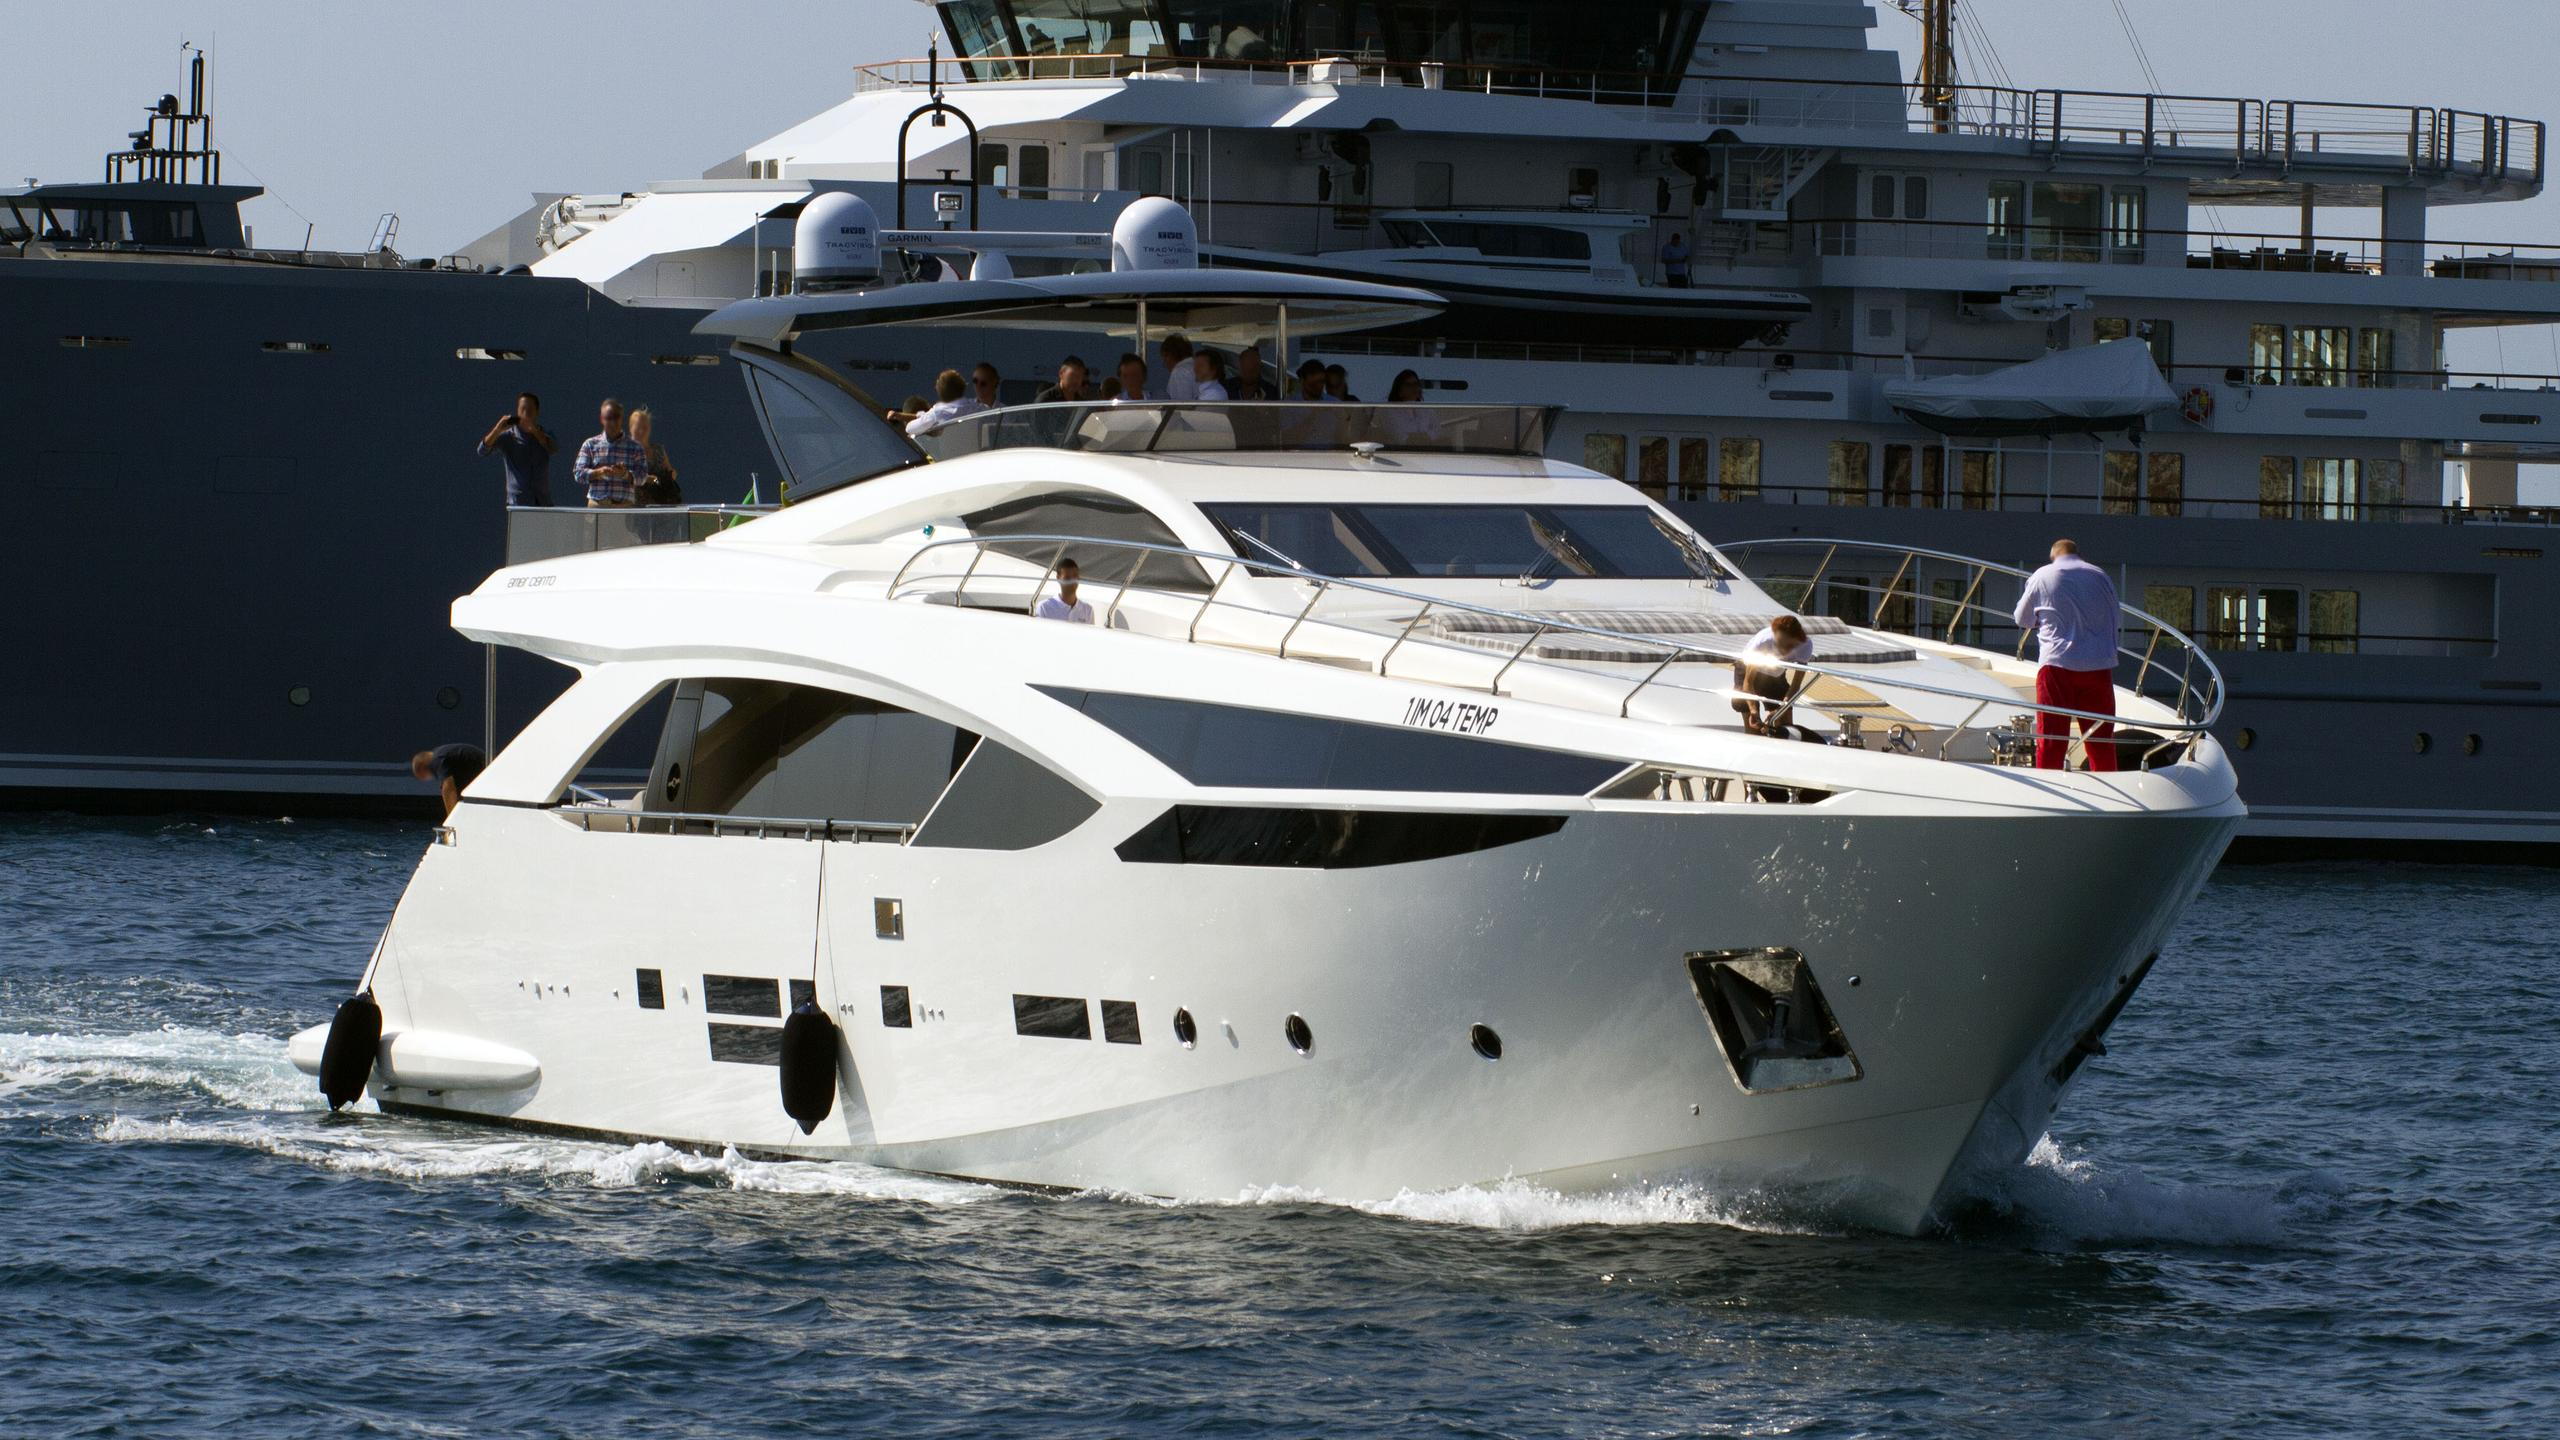 amer cento quad motoryacht permare 2016 30m cruising half profile